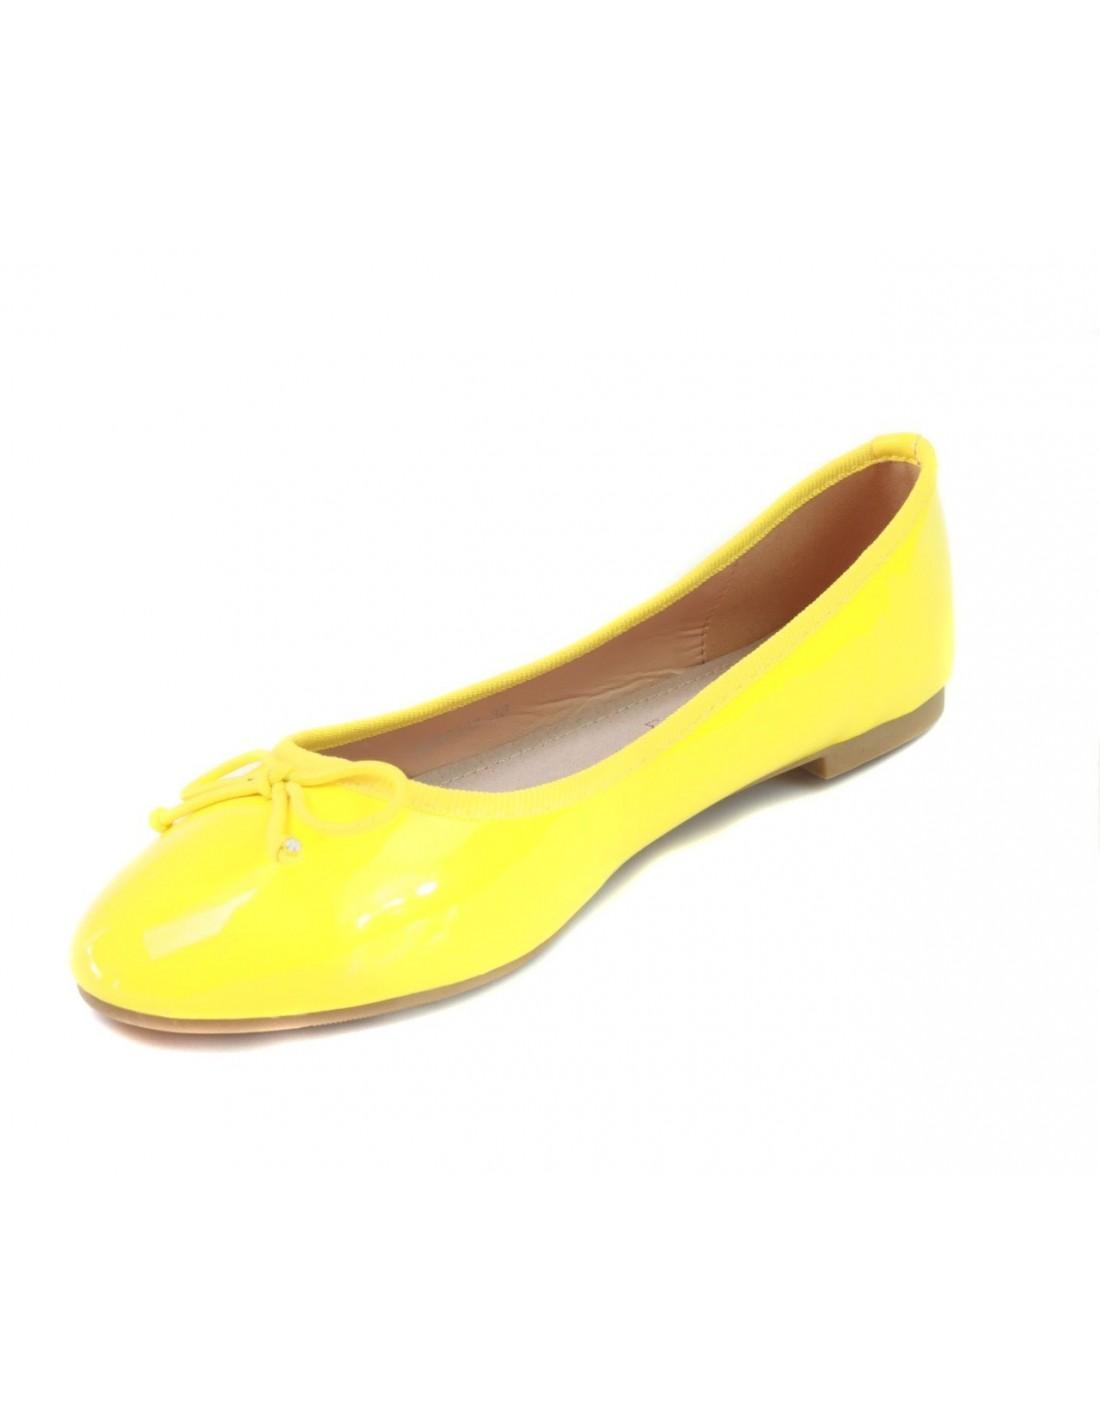 ballerines femme vernis jaunes pas cher avec semelle en cuir. Black Bedroom Furniture Sets. Home Design Ideas